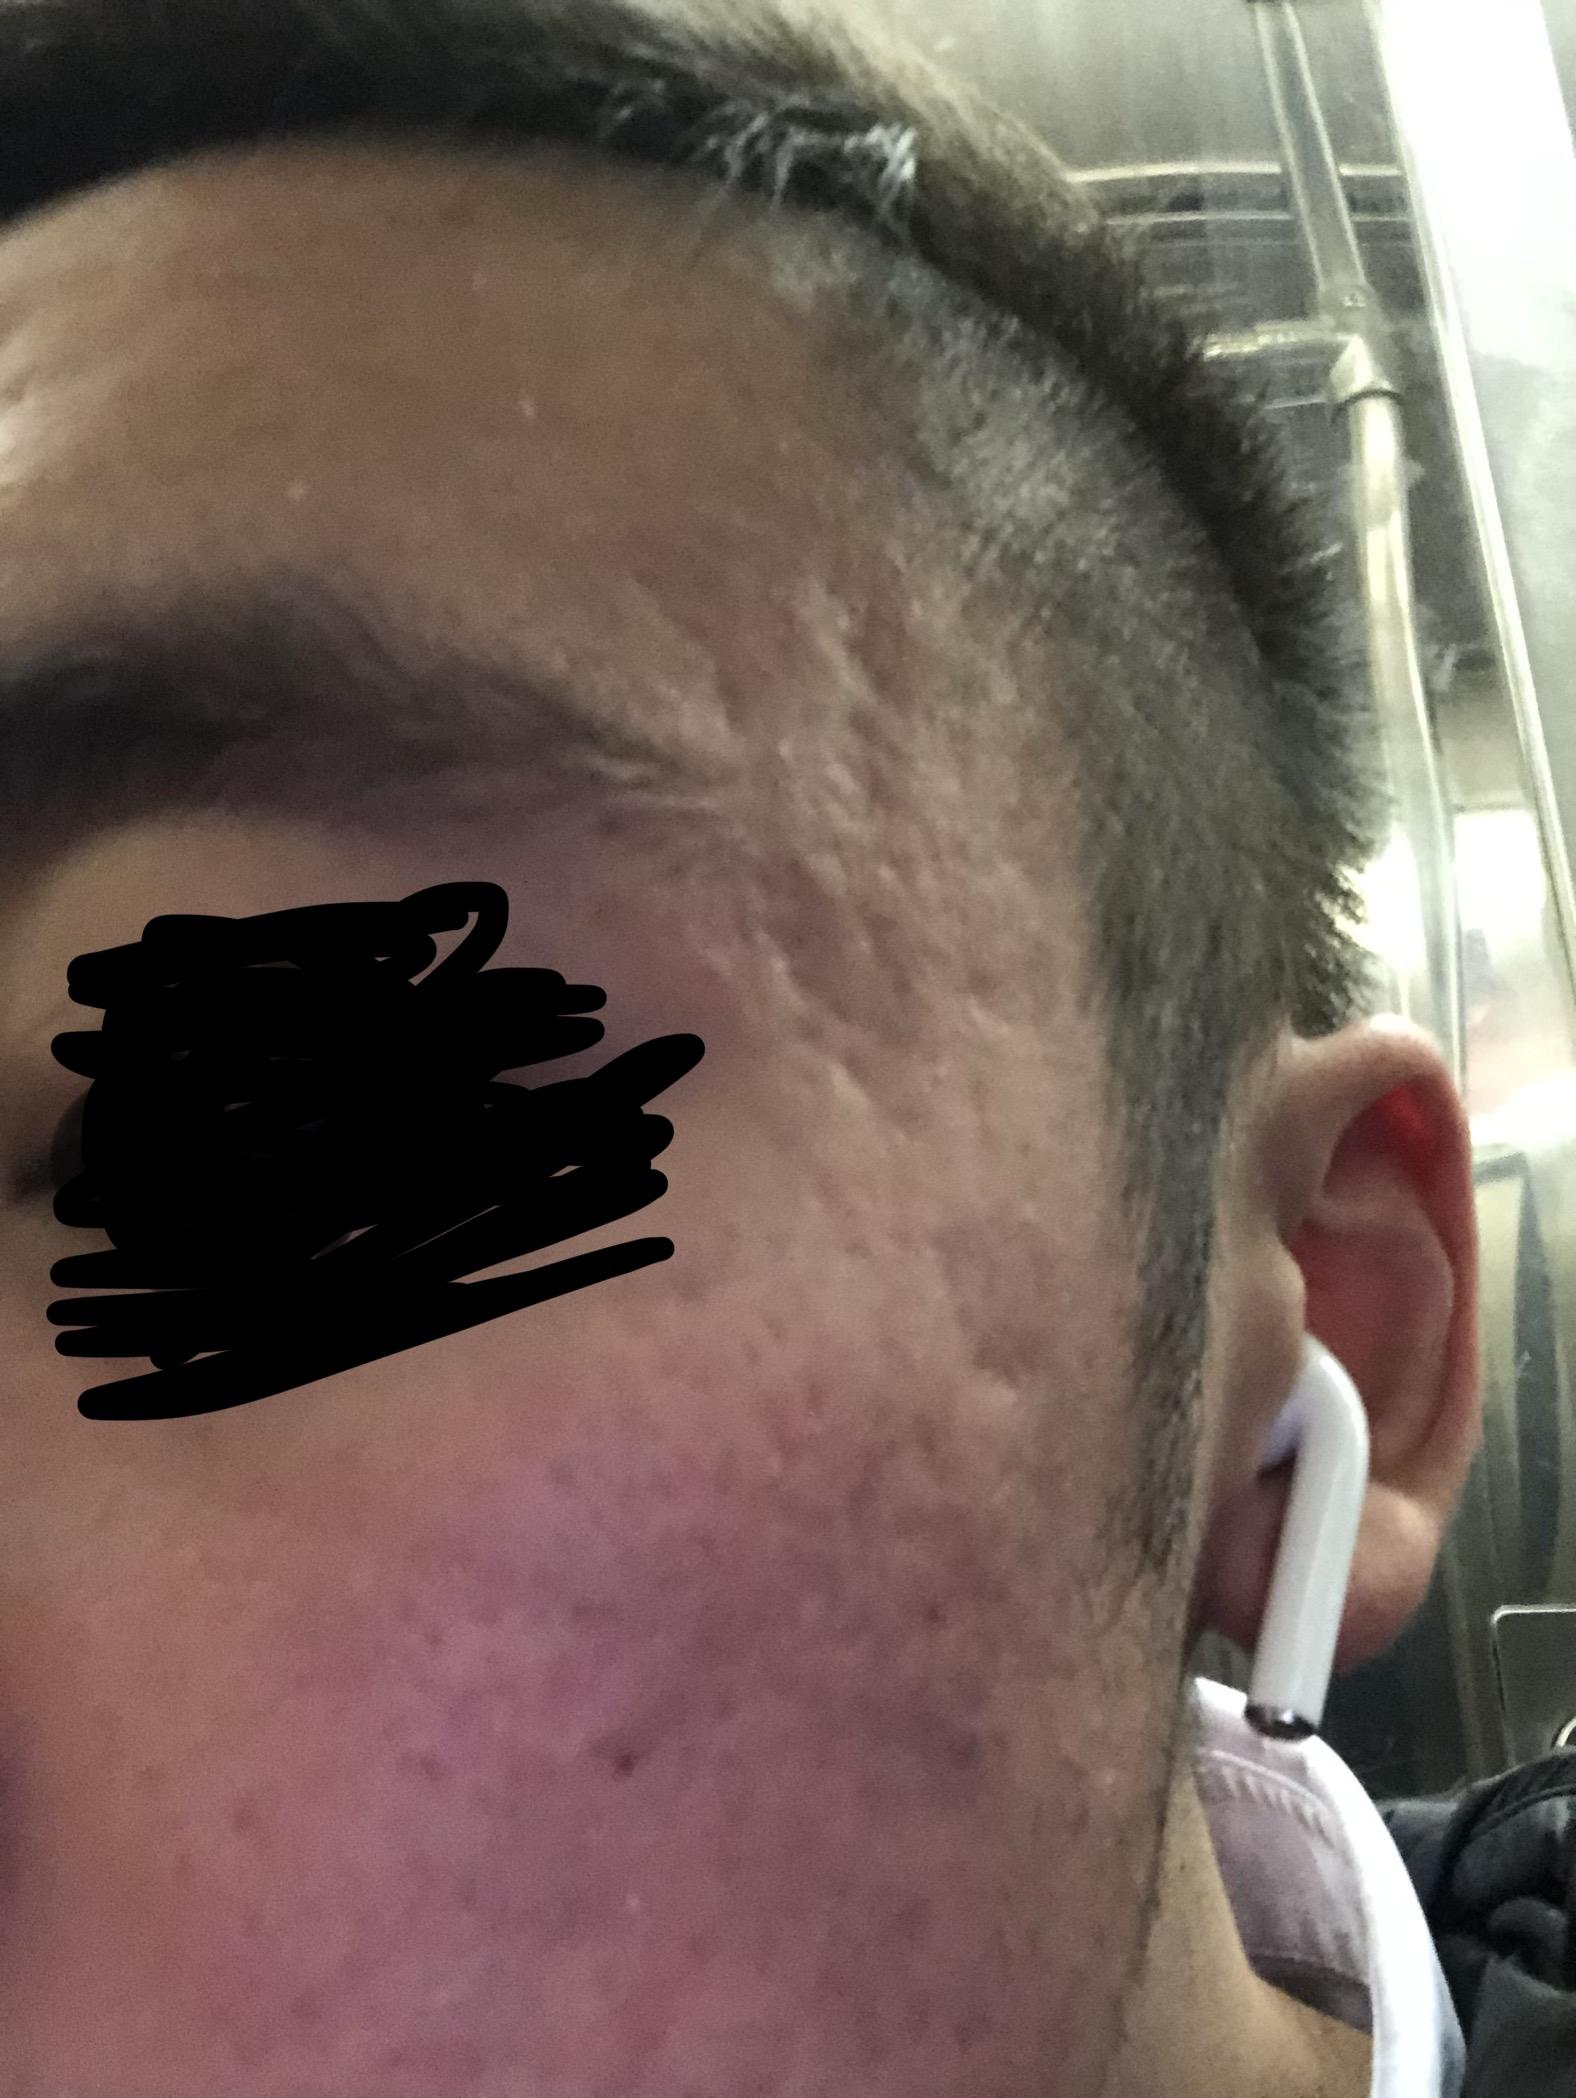 Desperate Question On My Scar Acne Scar Treatments While High Dose Accutane Scar Treatments Acne Org